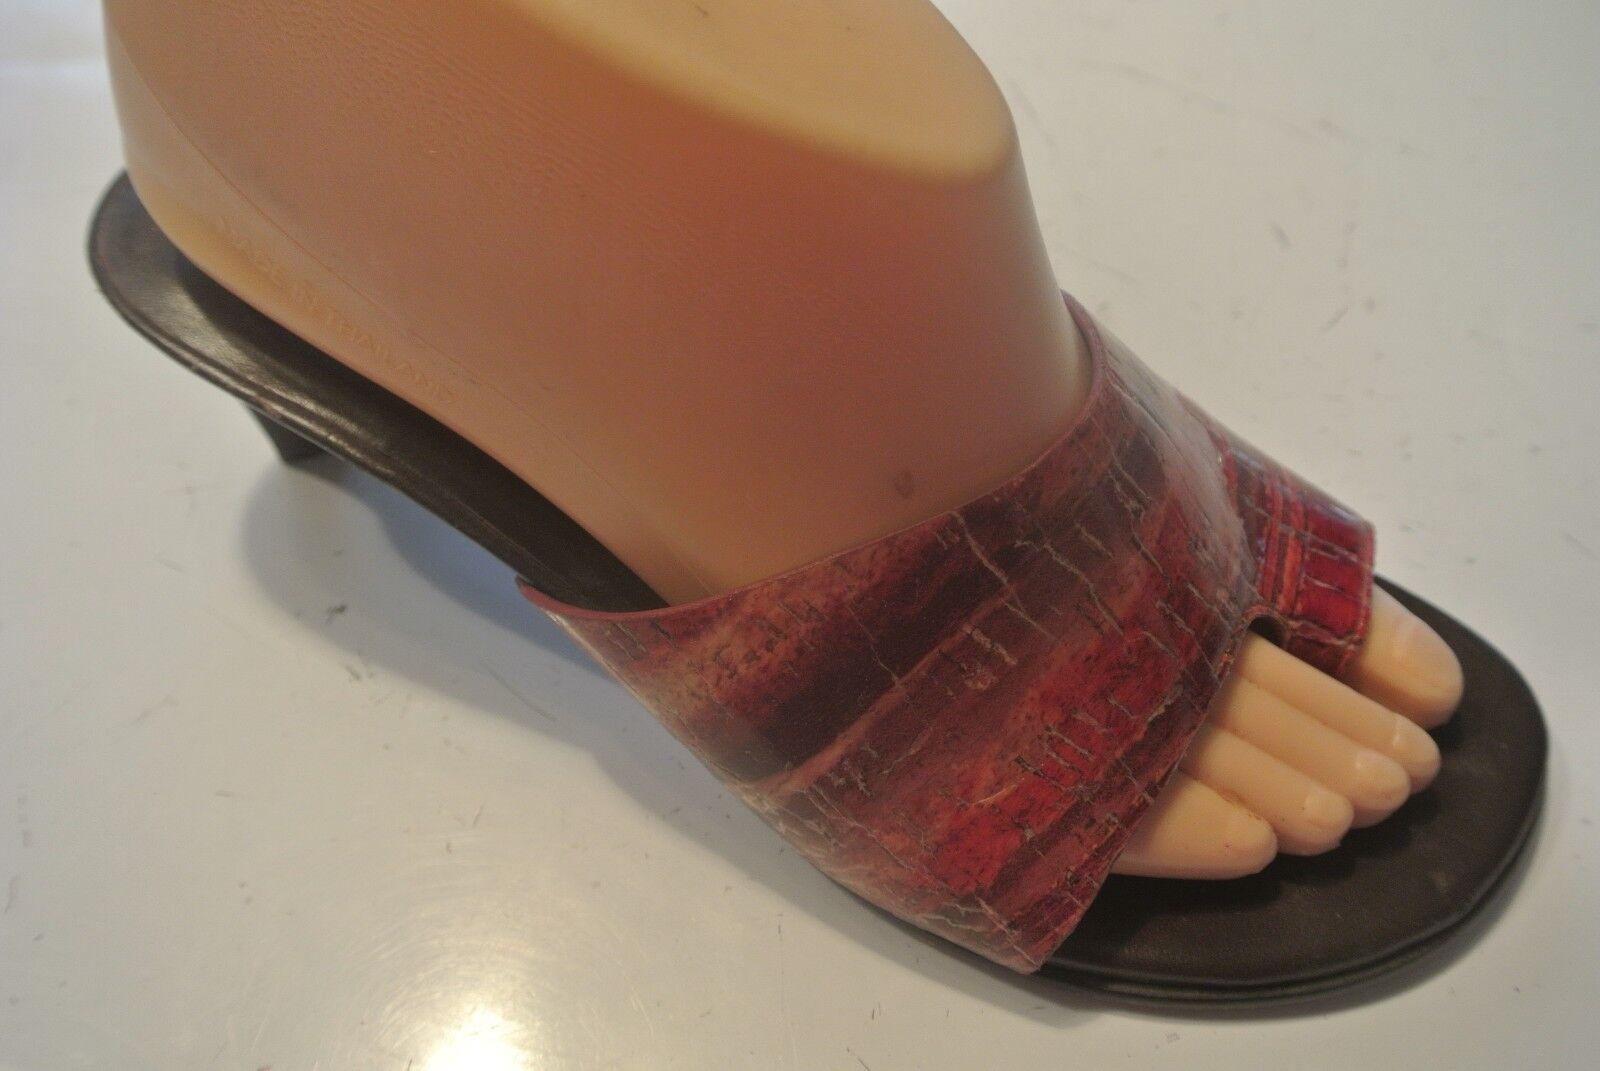 Donald Pliner Velda Red Orange Slide Sandals Toe Wrap Shoes Size 6.5 @ cLOSeT